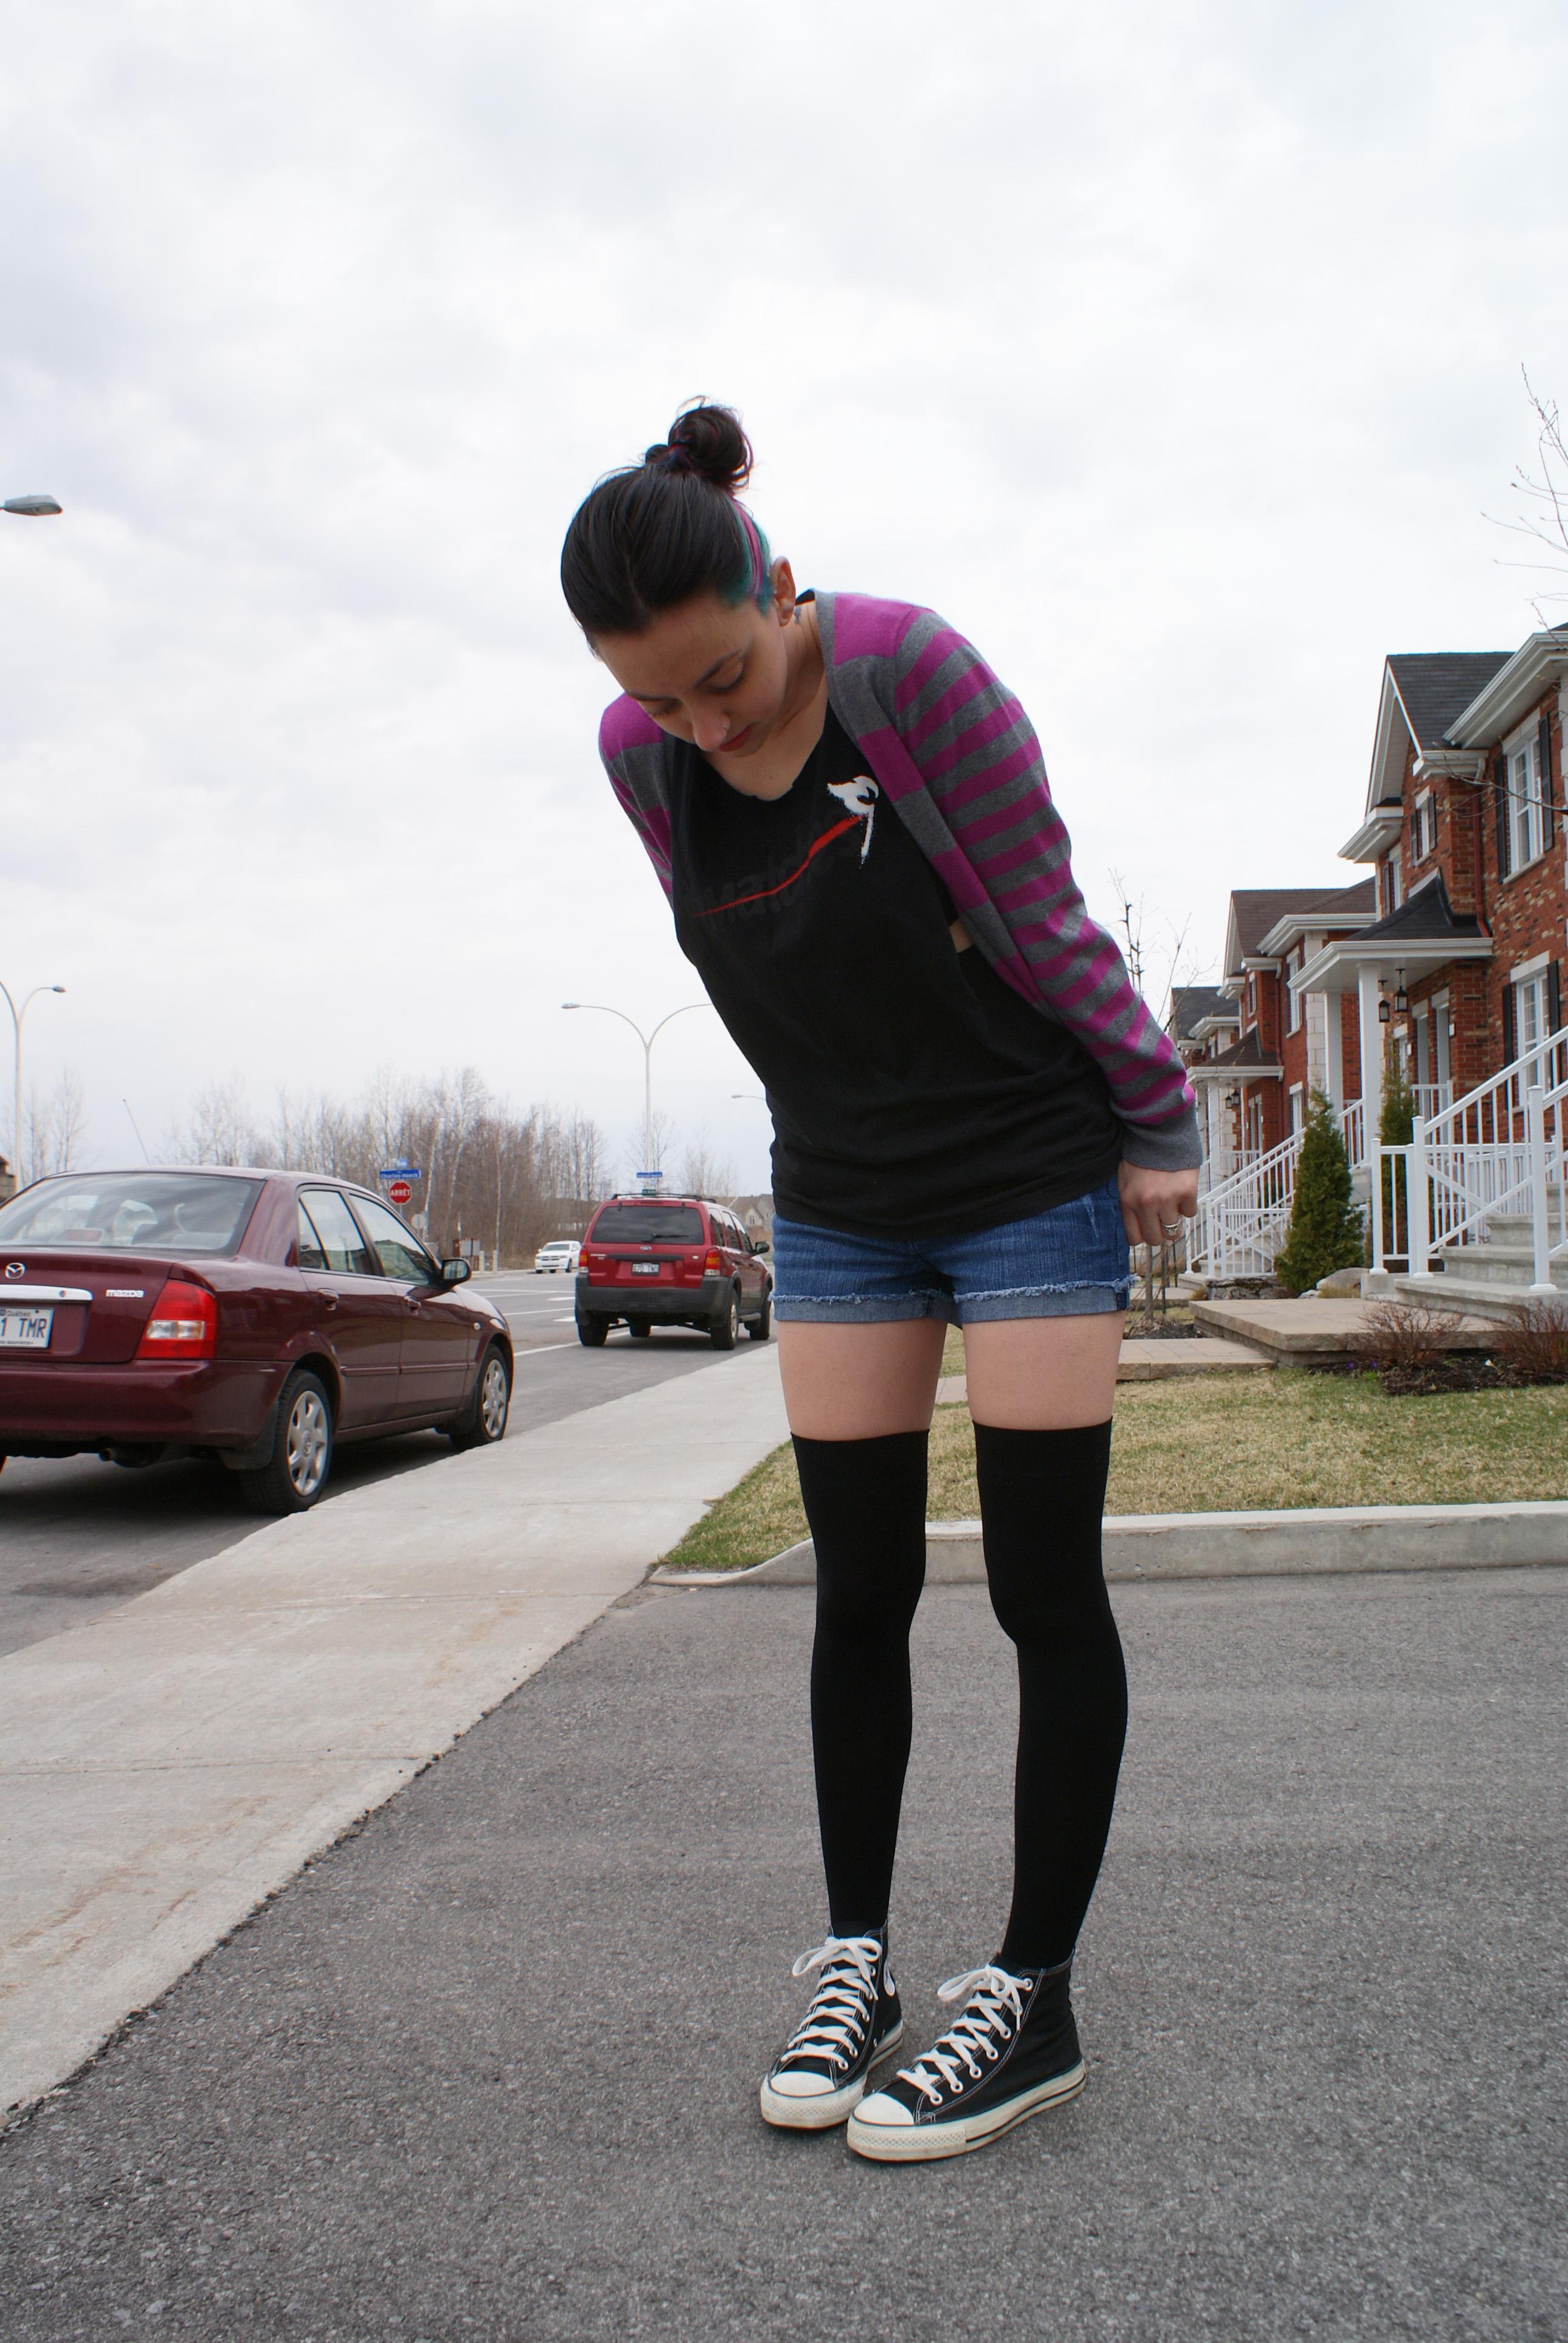 emo-converse-knee-high-socks-xxx-deep-pusie-fisting